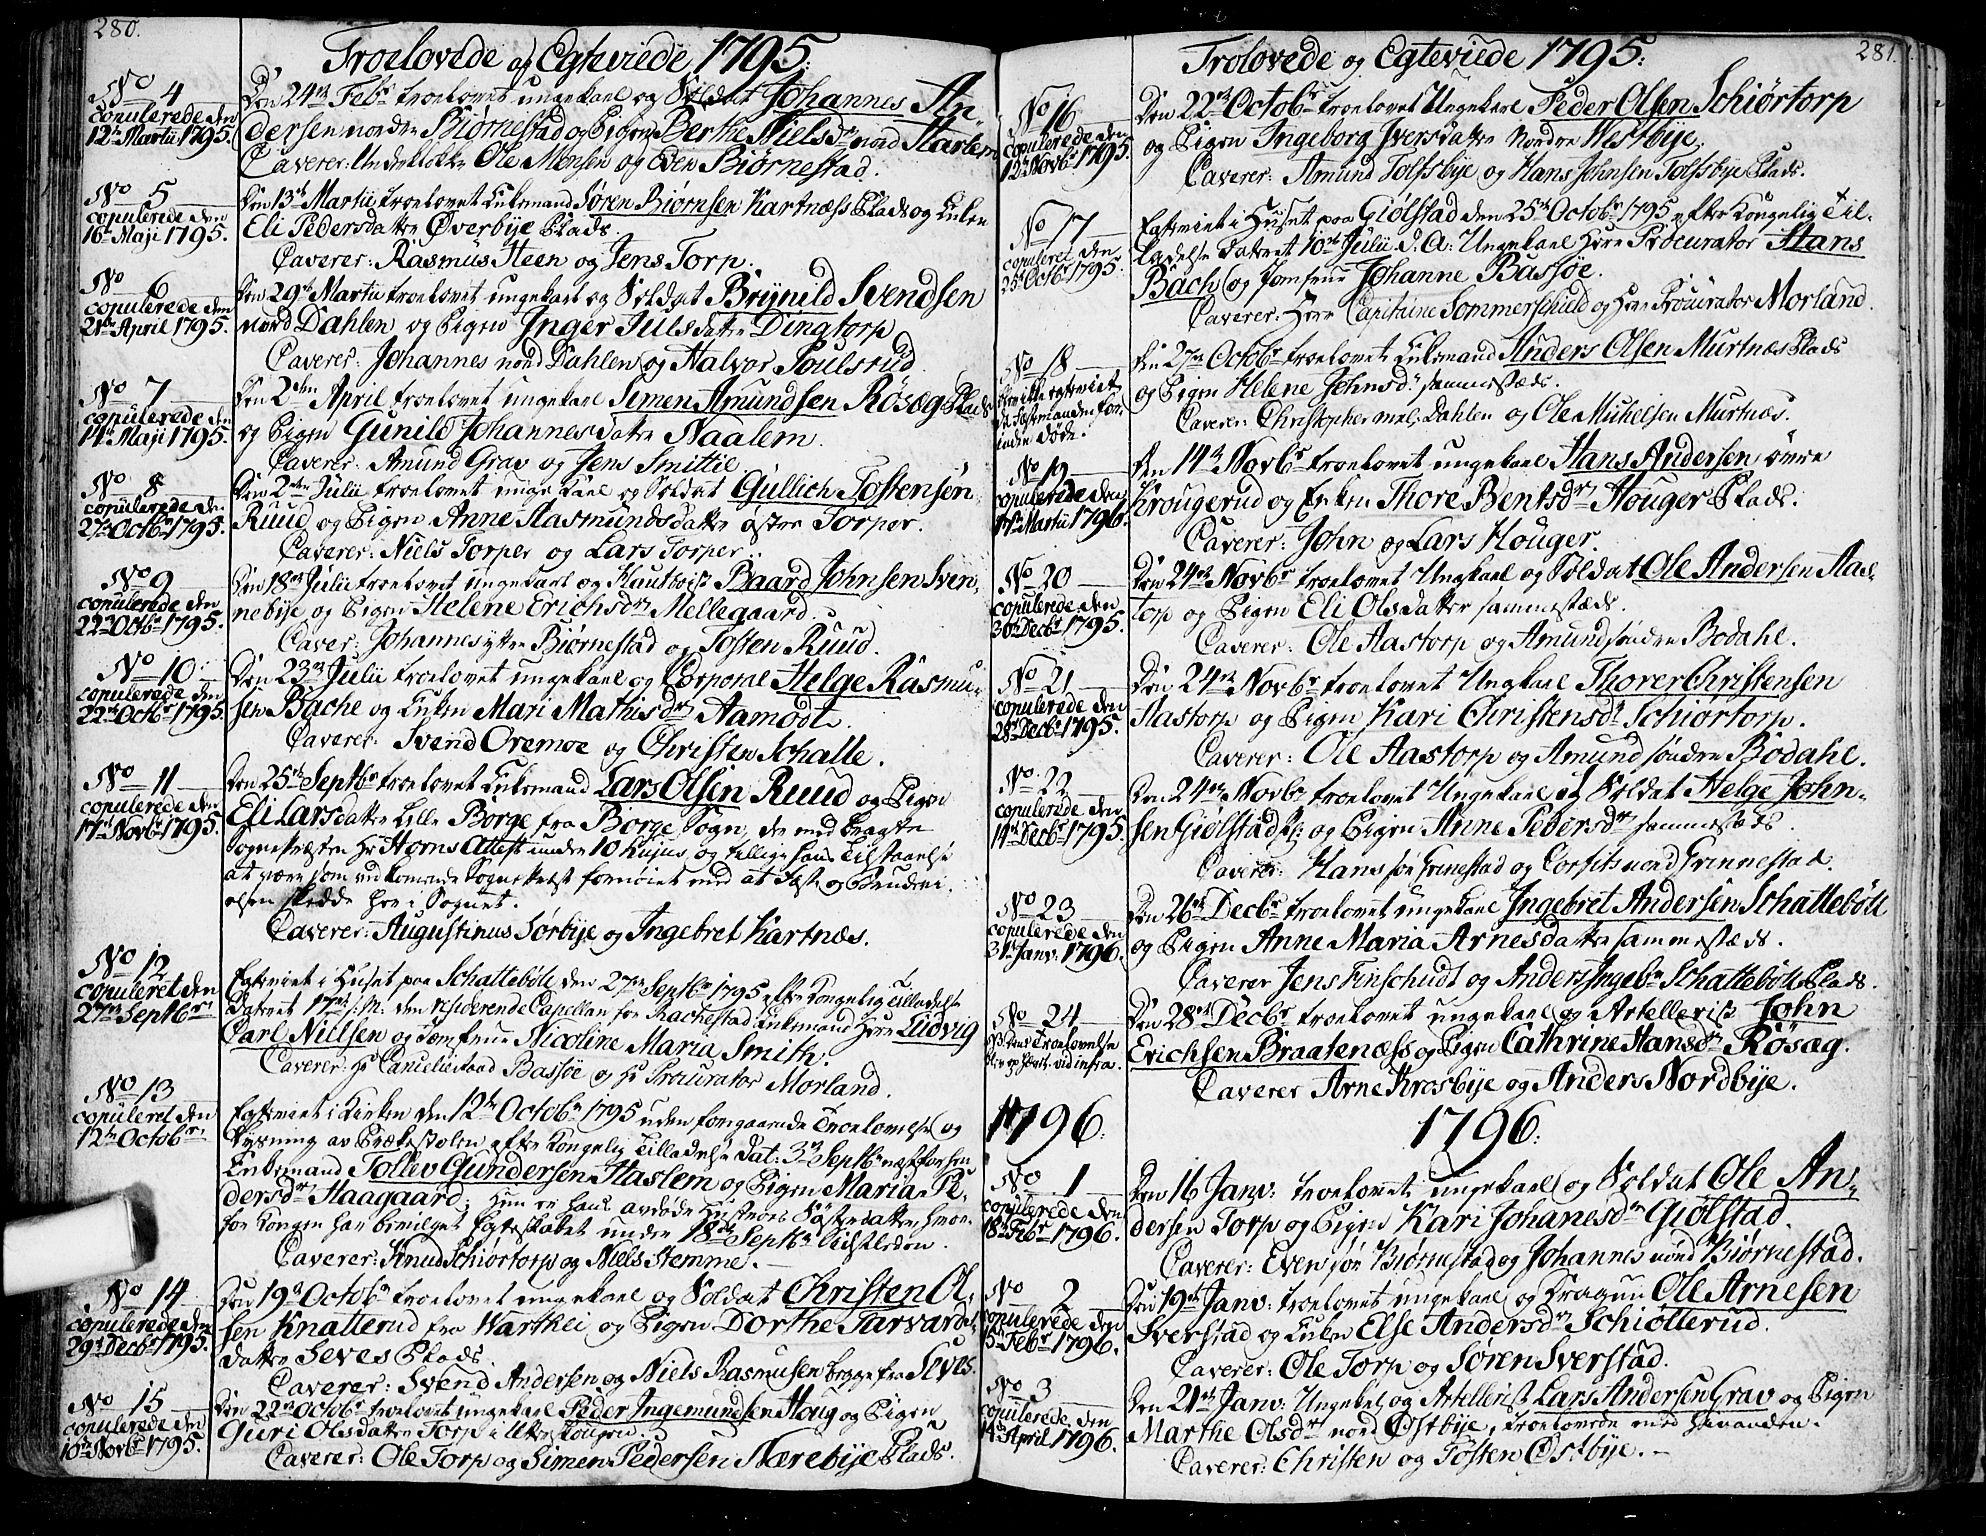 SAO, Rakkestad prestekontor Kirkebøker, F/Fa/L0005: Ministerialbok nr. I 5, 1784-1814, s. 280-281